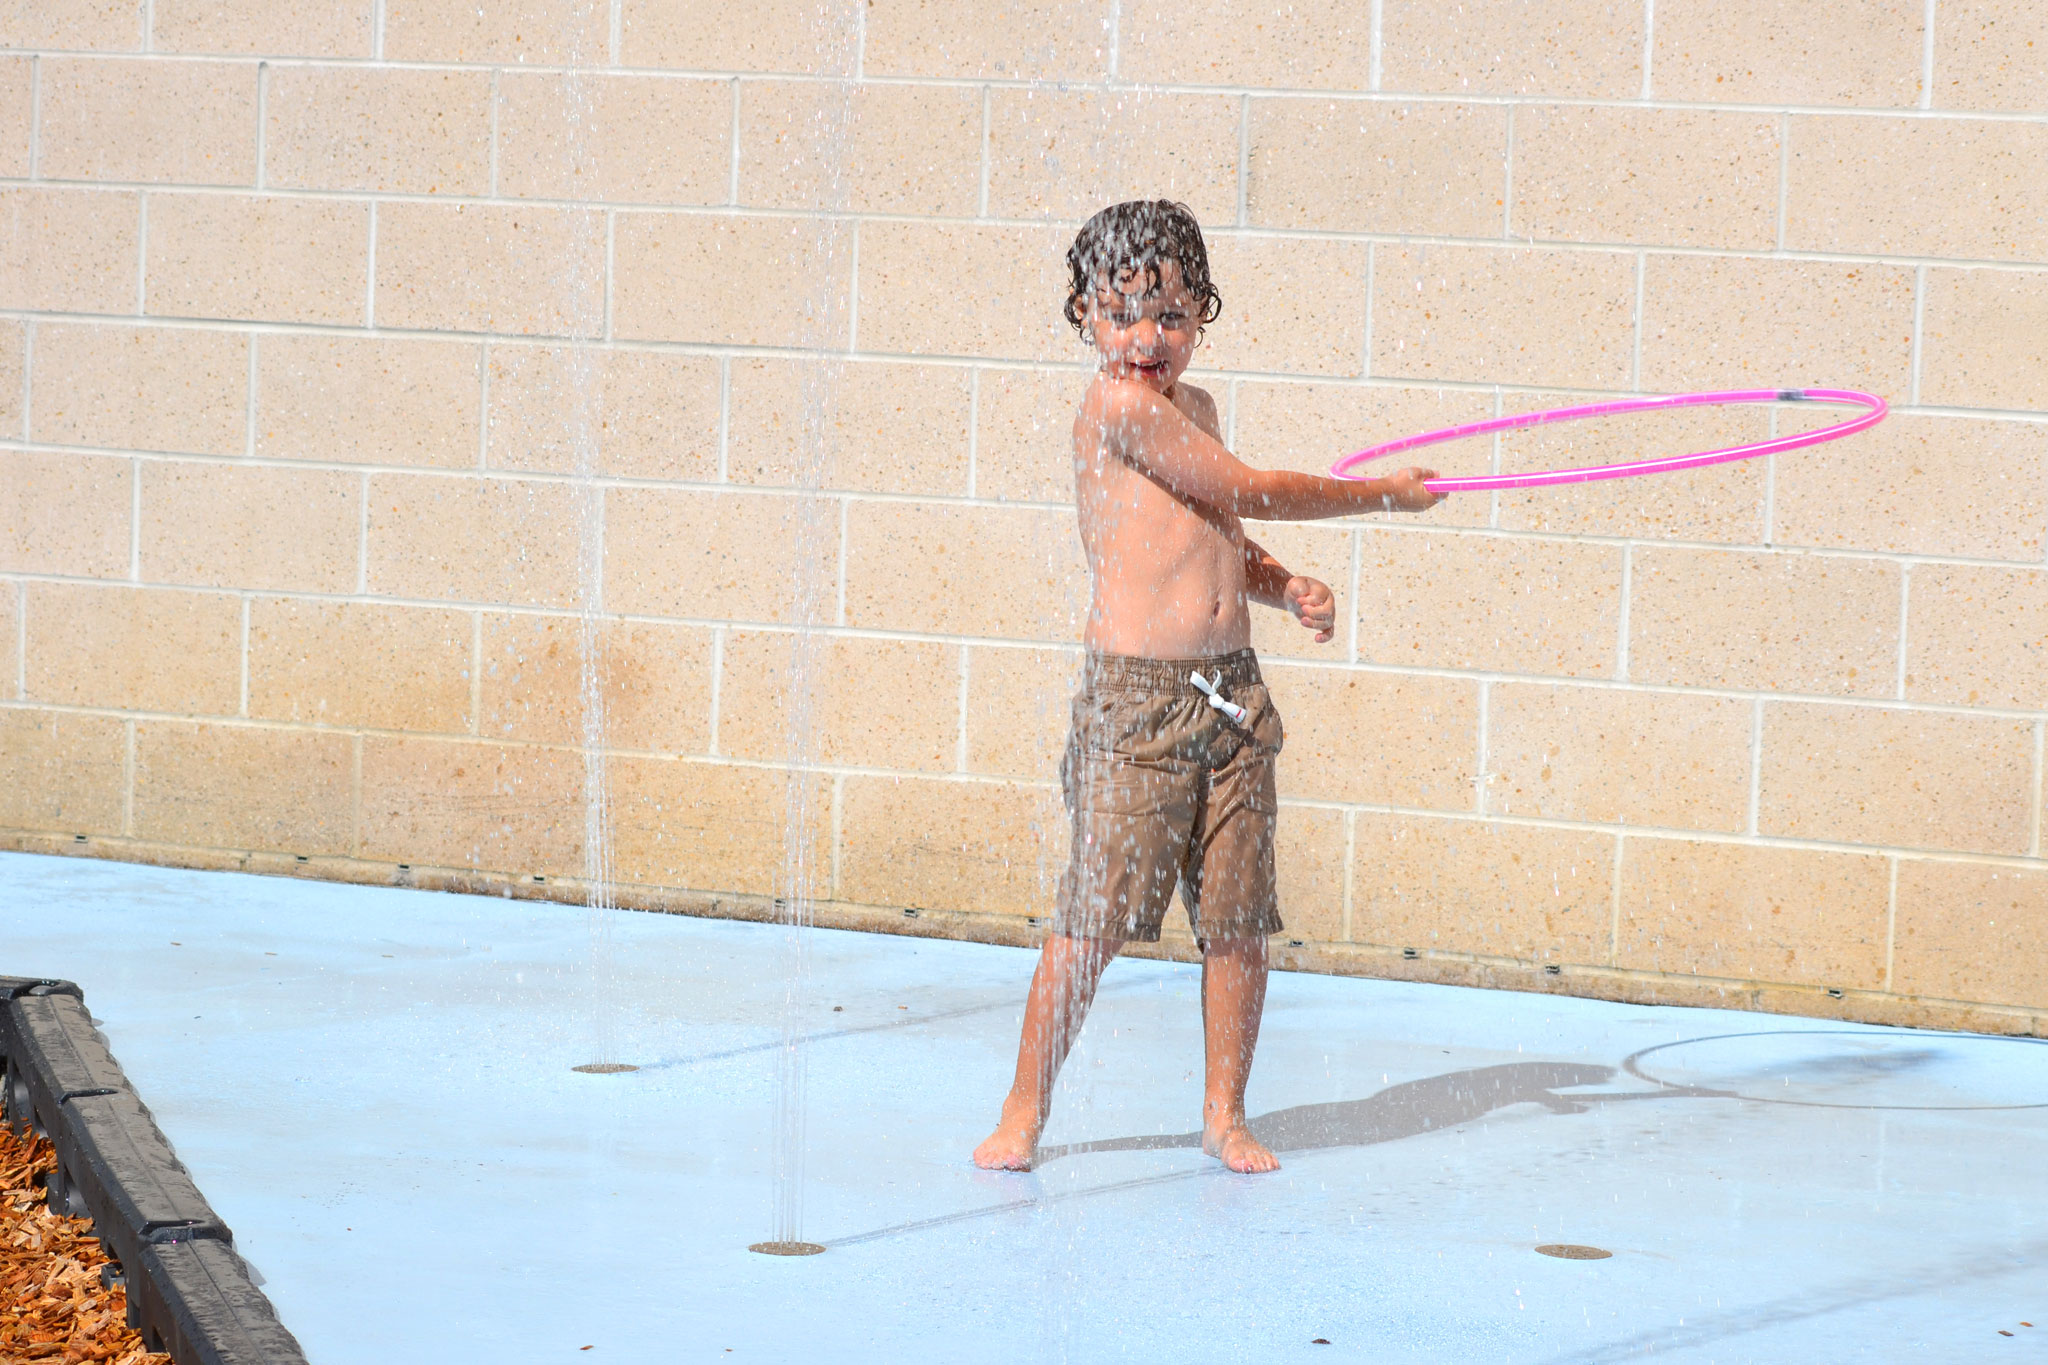 Water Splash Park Design and Controls